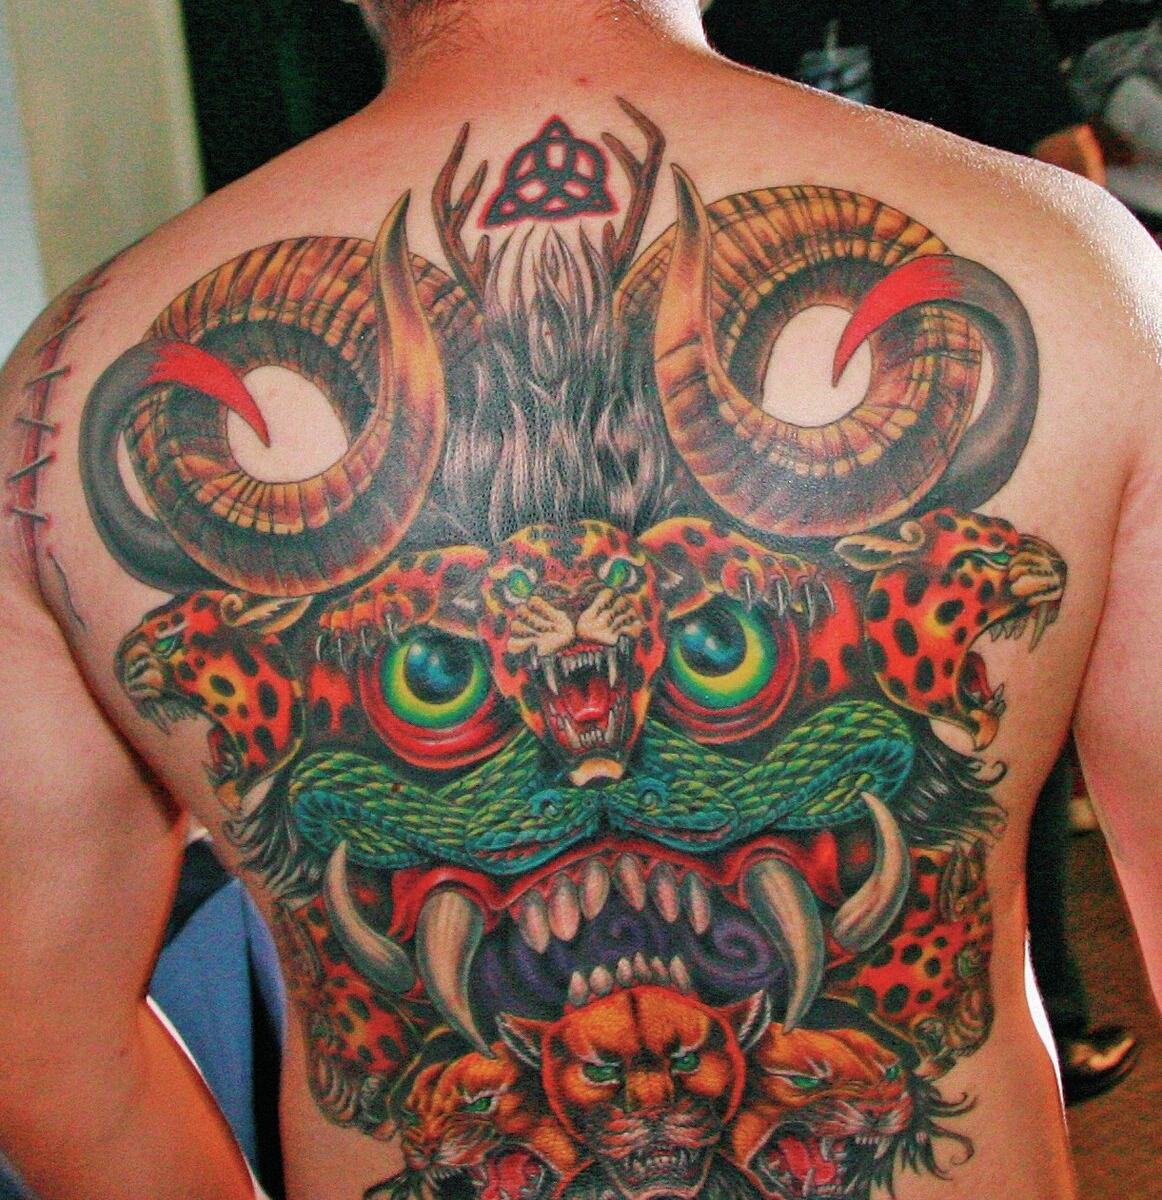 mexico city tattoo convention lowrider arte magazine